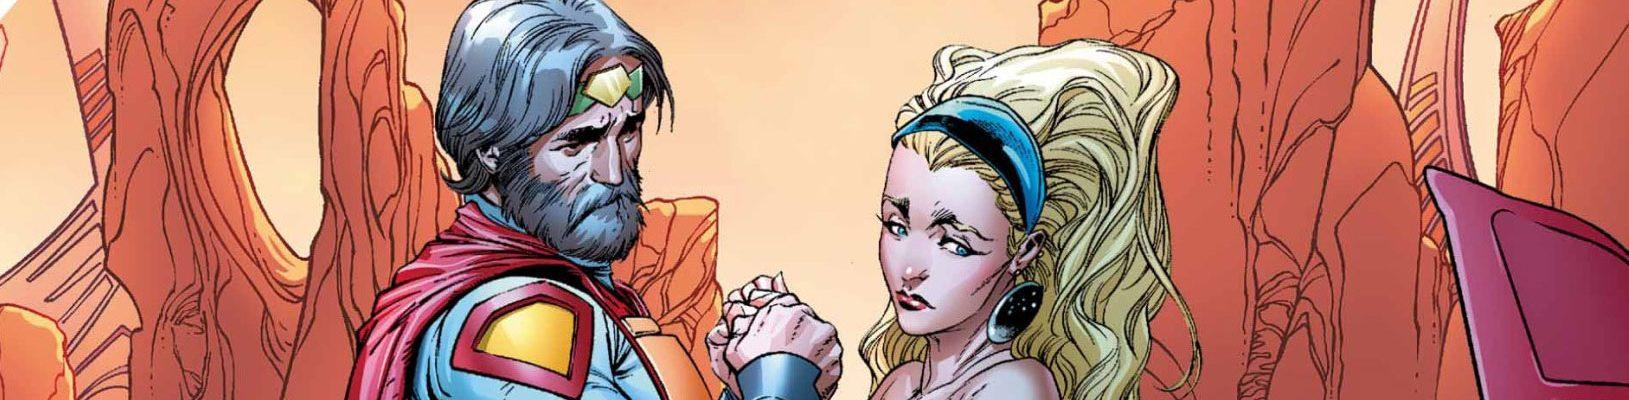 Action Comics 988